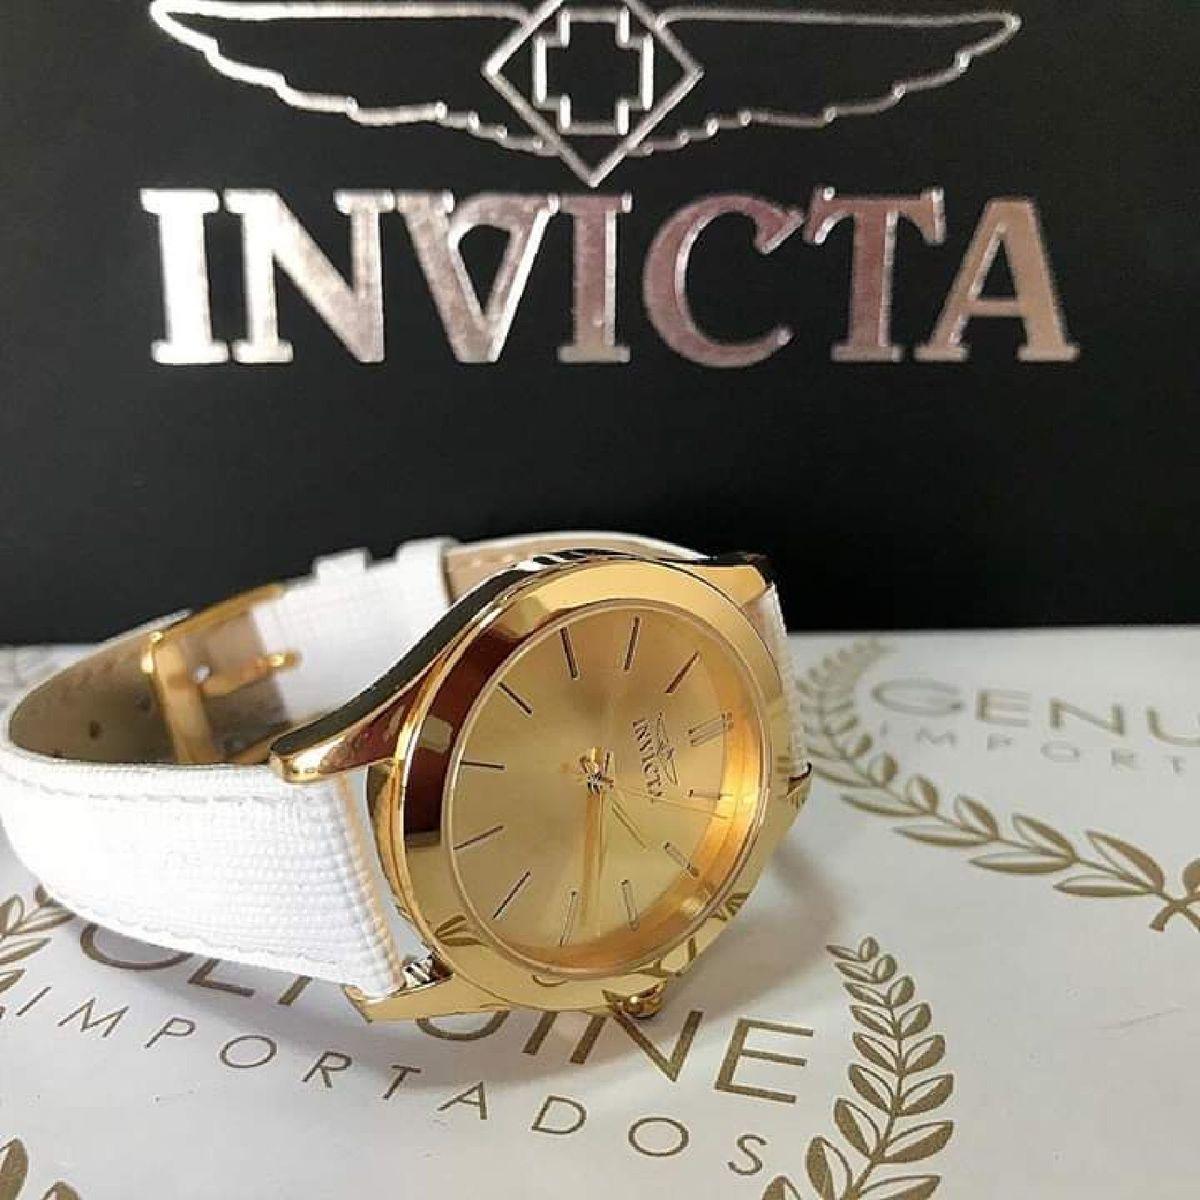 efa6f57003f Relogio Invicta Original Angel 15149 Banho de Ouro 18k Pulseira Couro  Branco